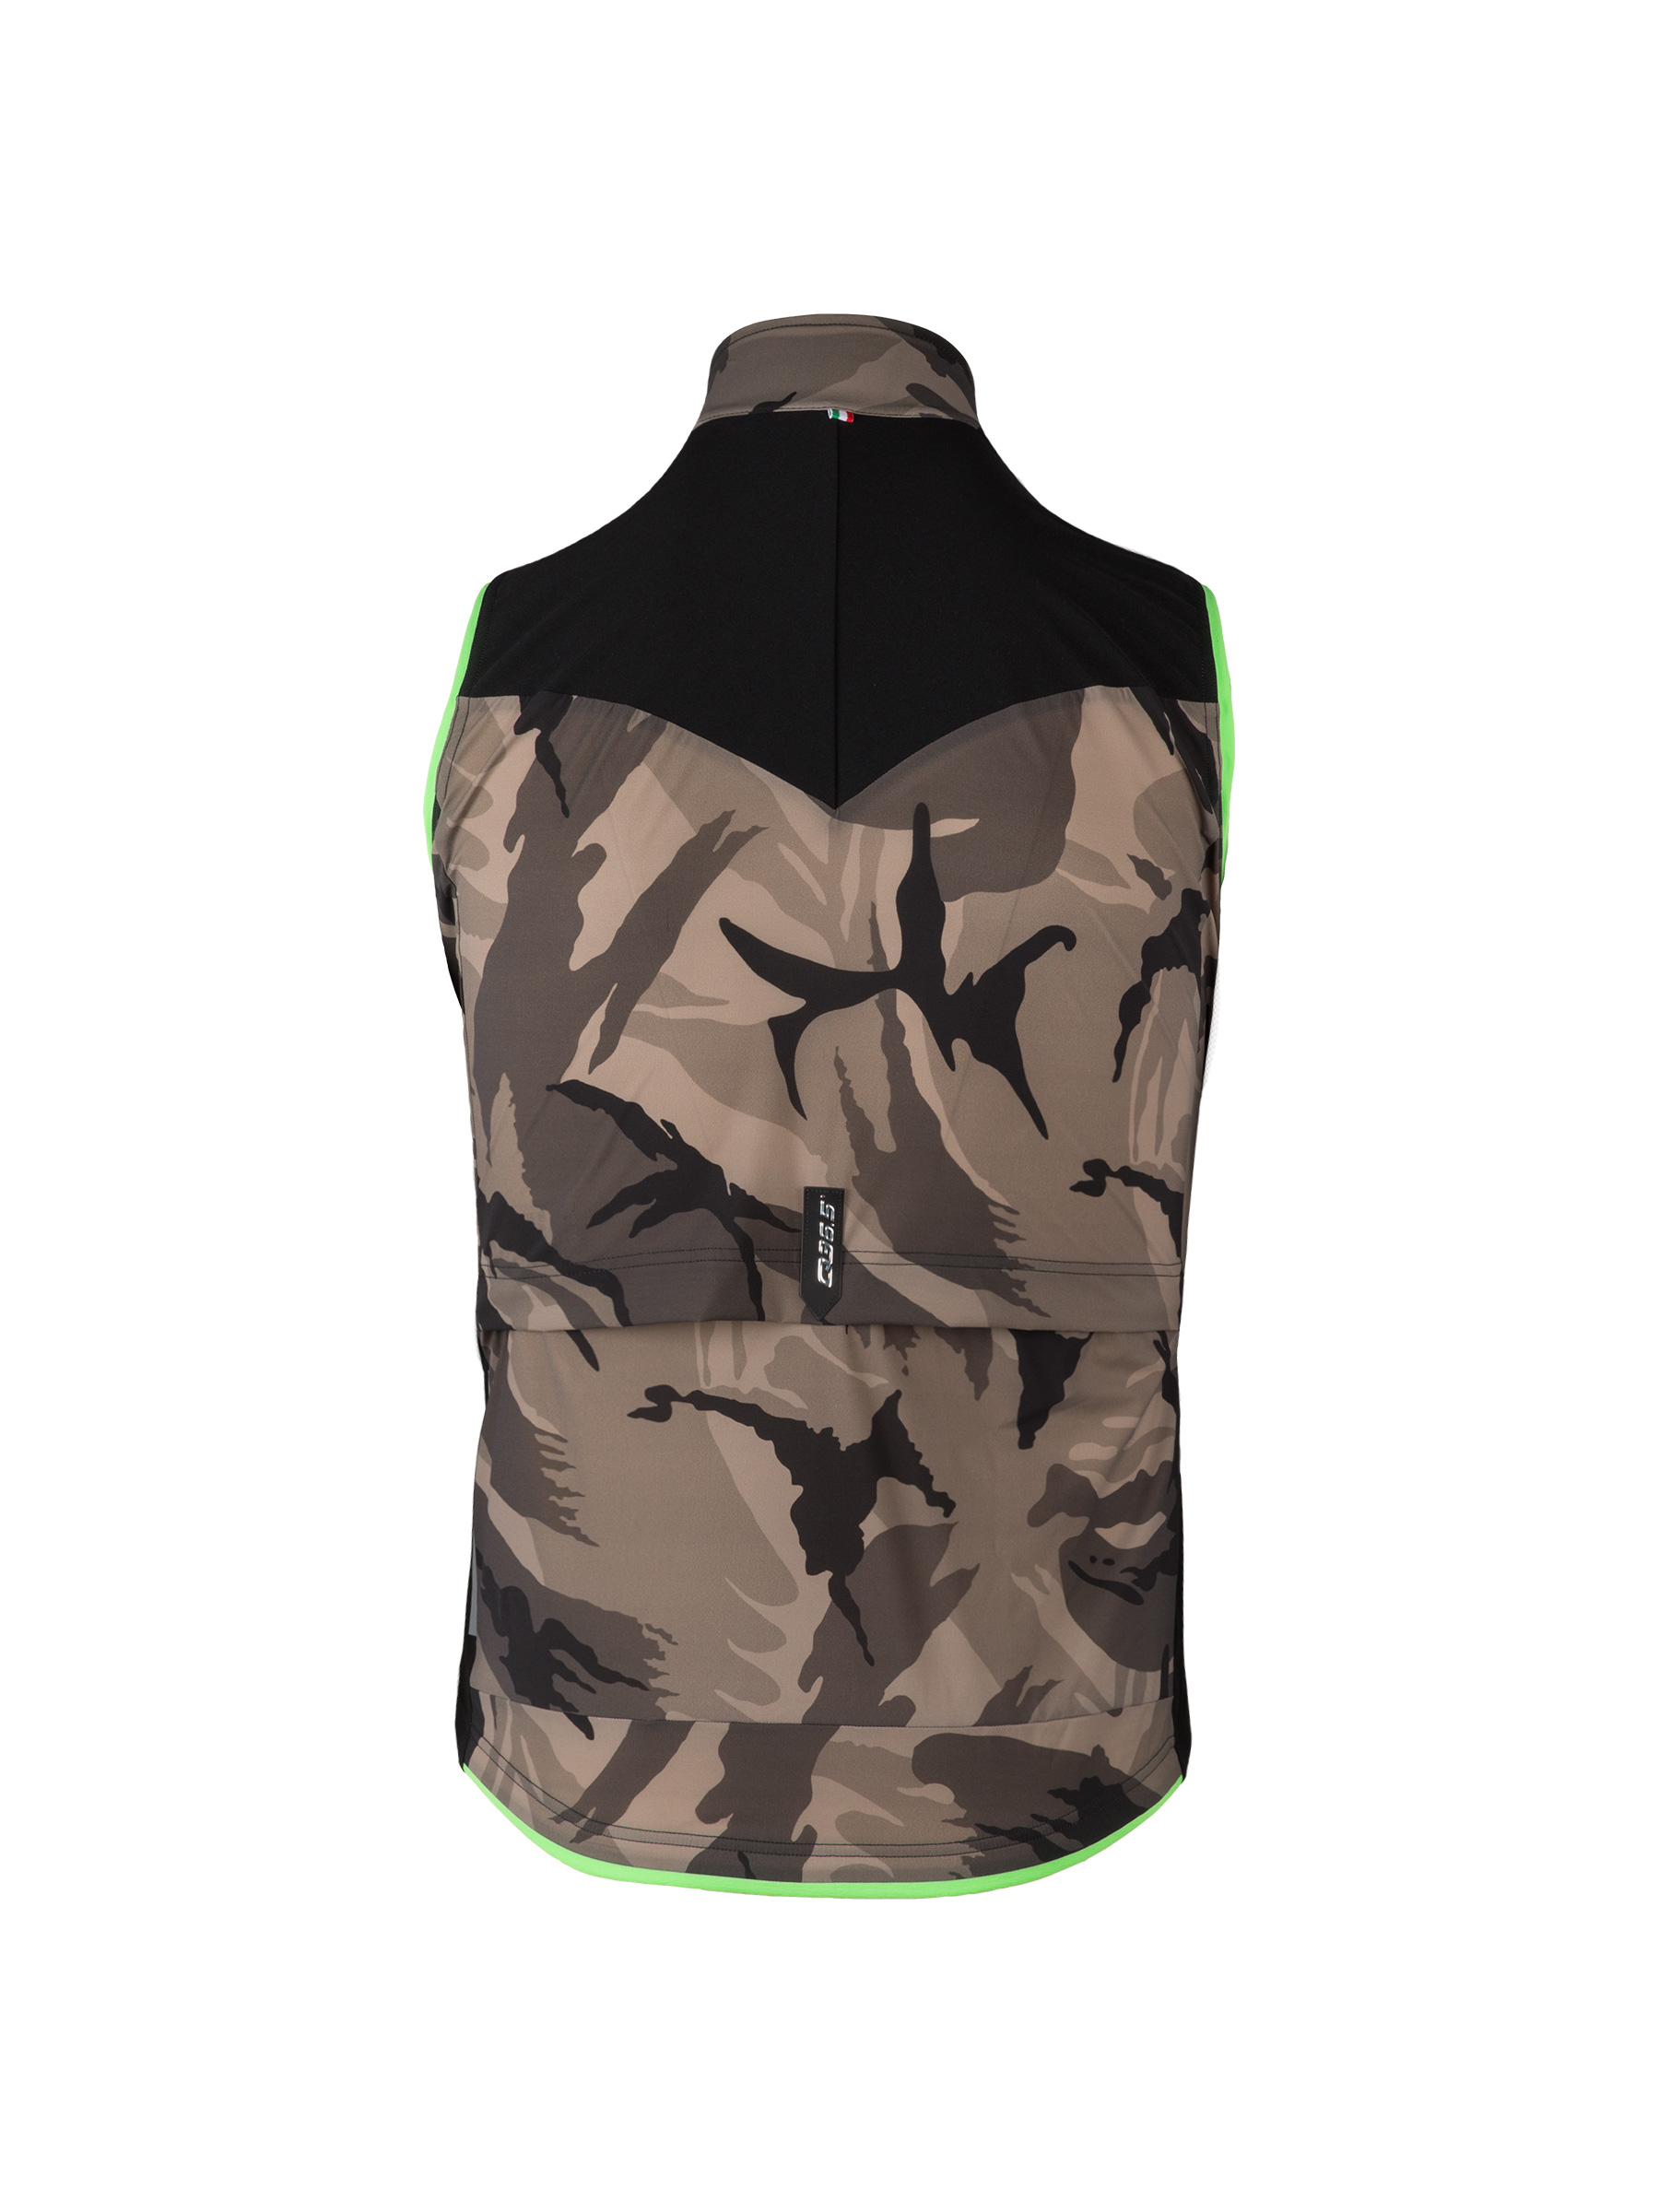 Vest L1 Essential Black Camouflage